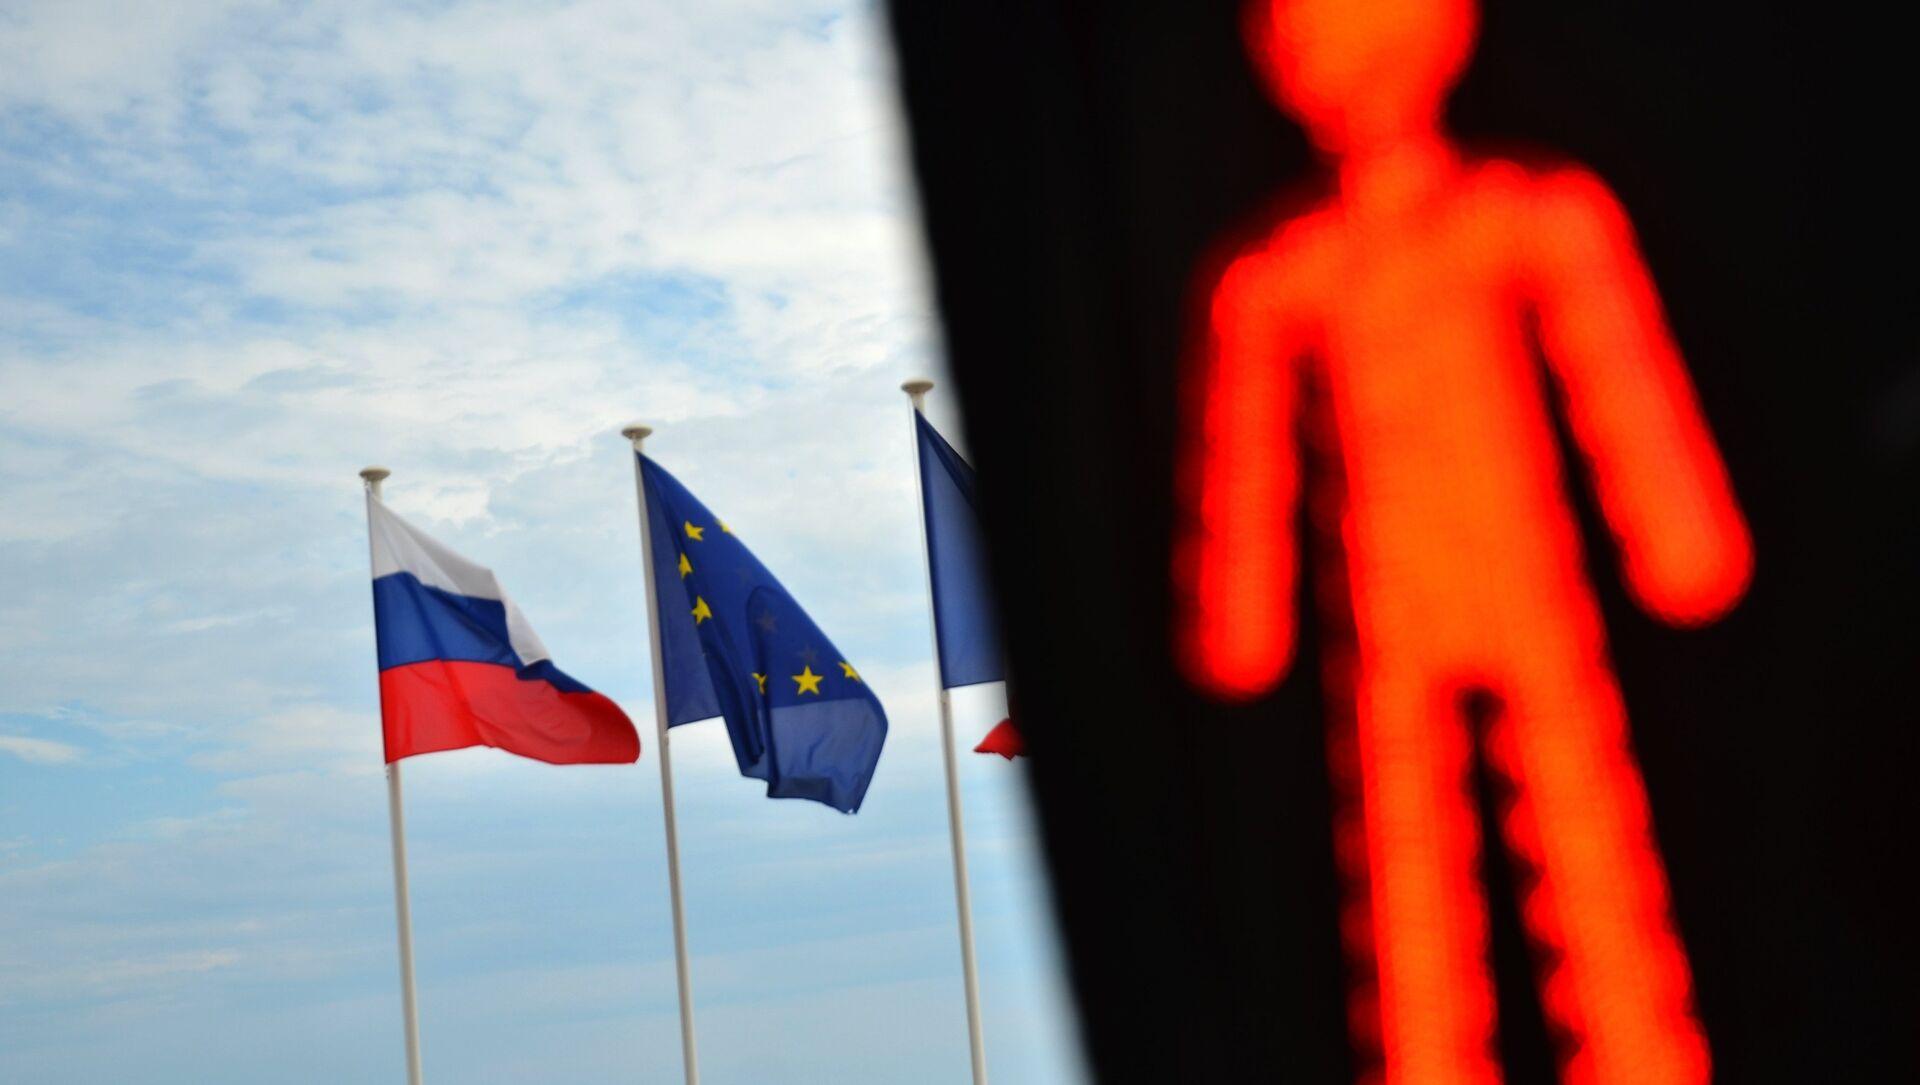 Flagi Rosji i UE - Sputnik Polska, 1920, 21.04.2021